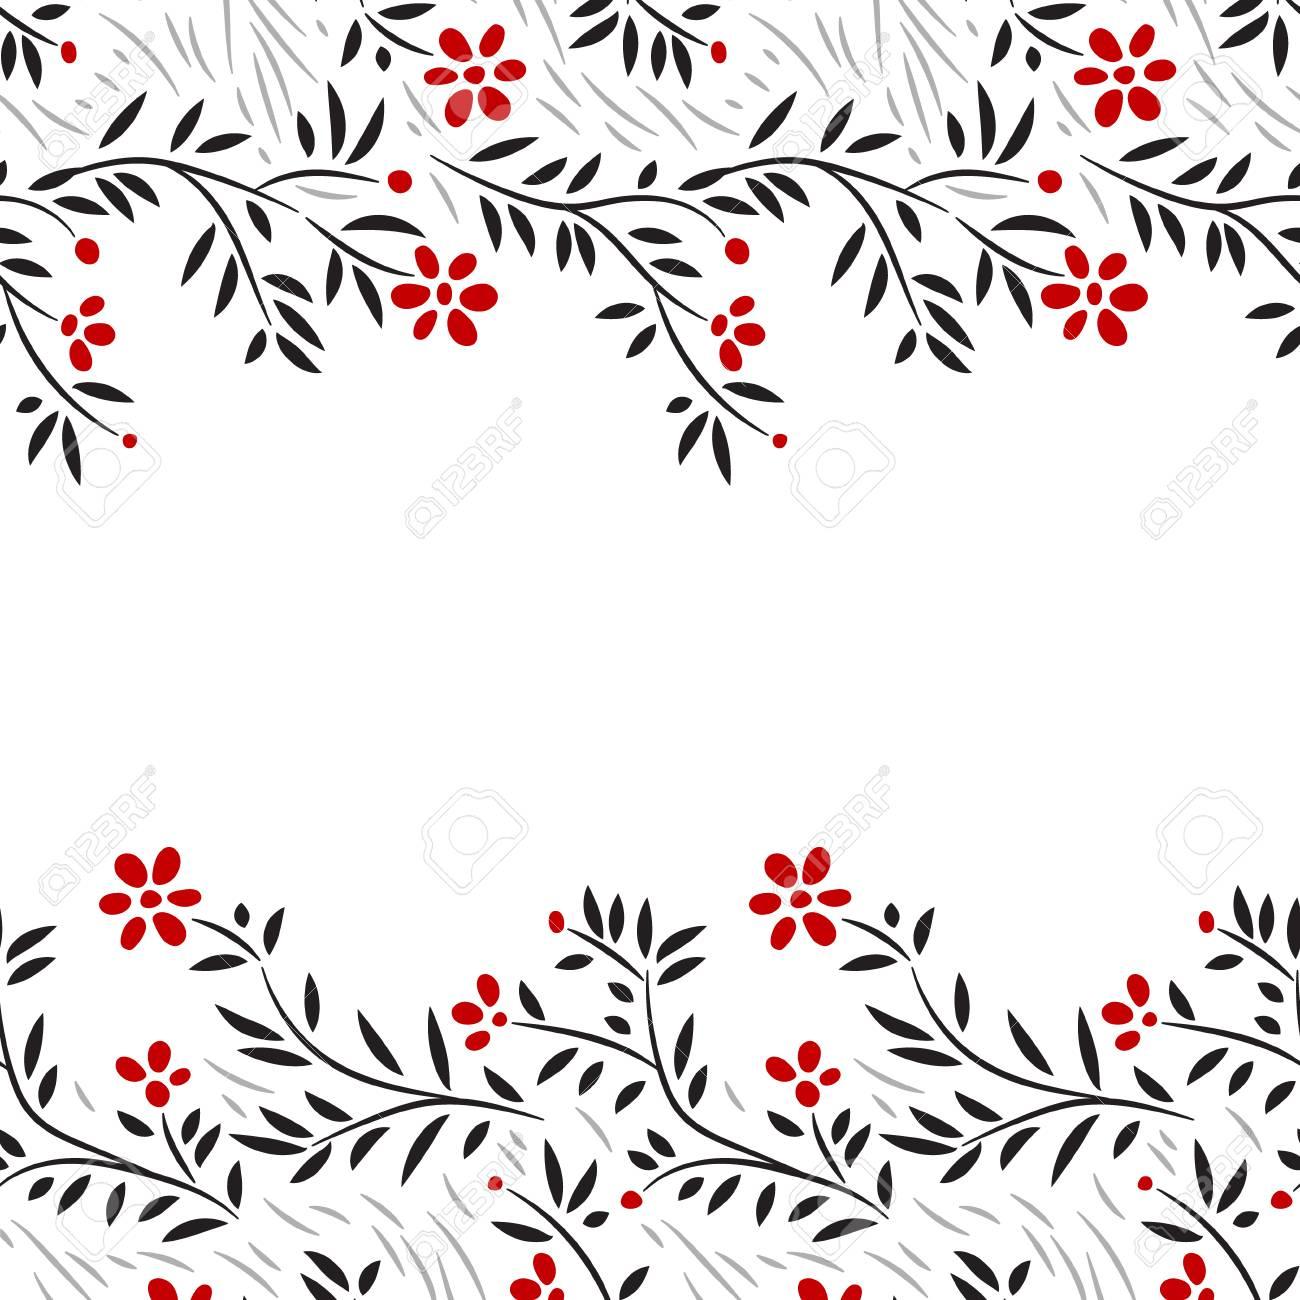 Black White And Red Flowers Horizontal Seamless Border On White